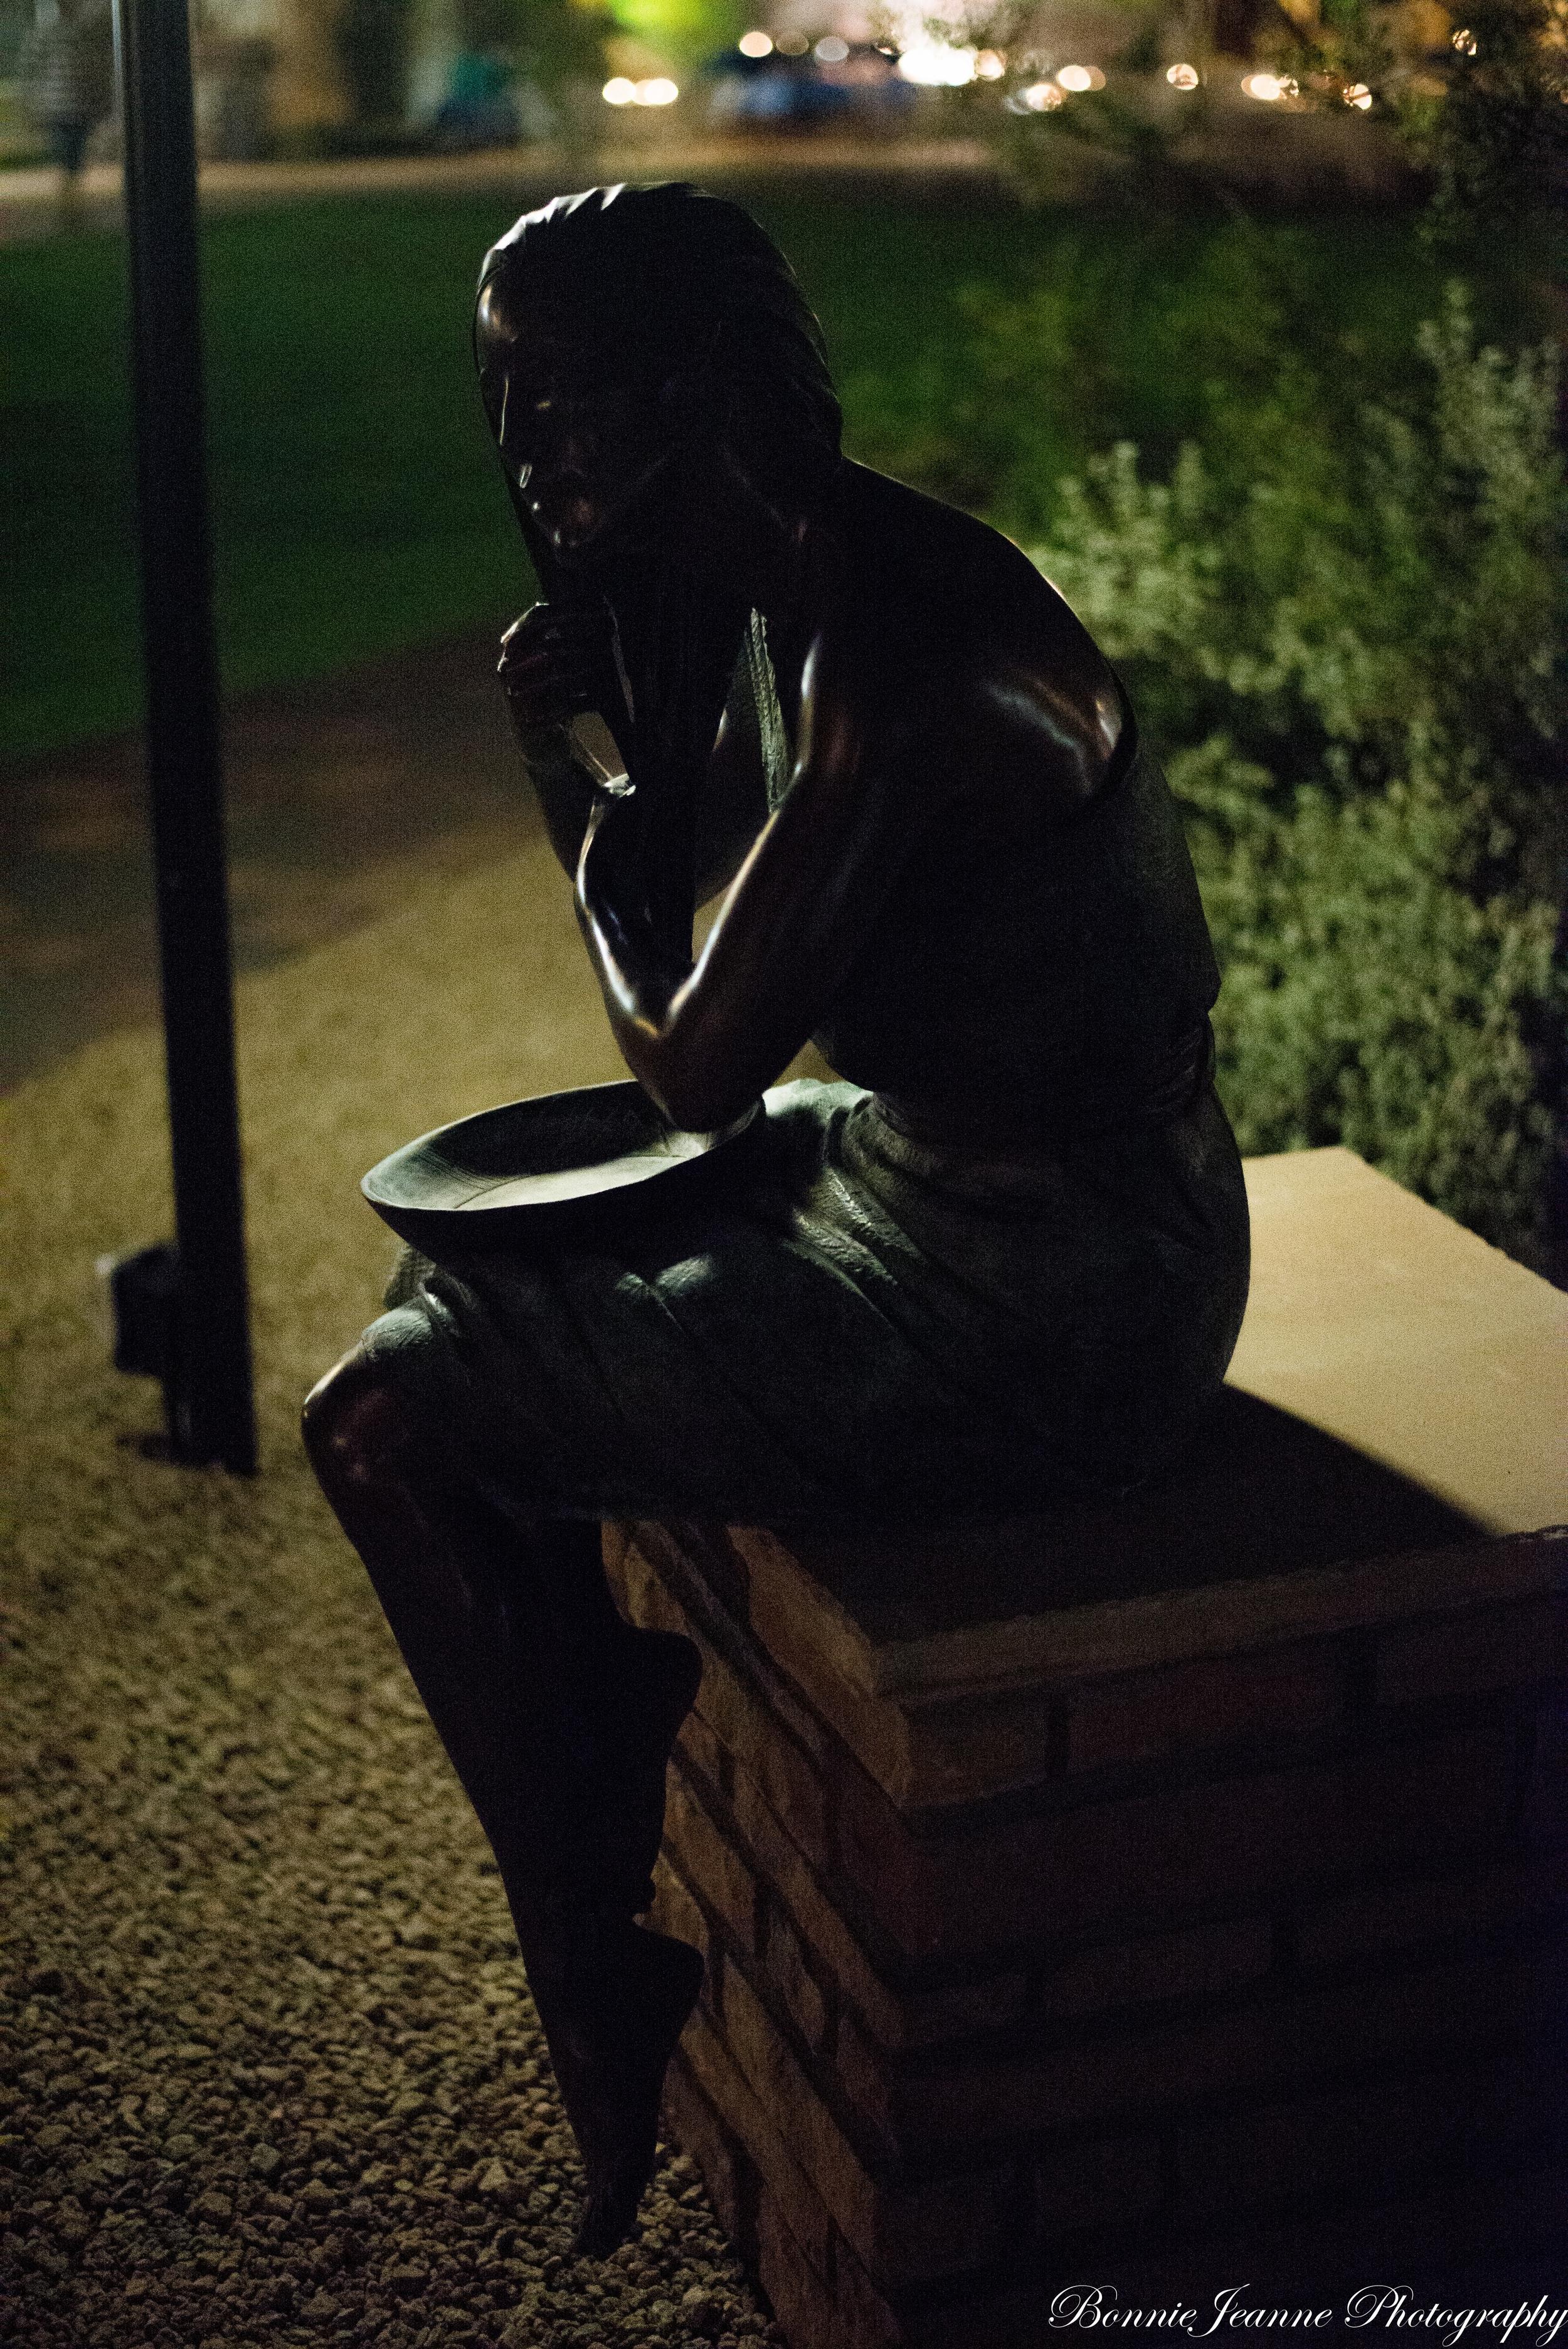 Contemplative Sculpture